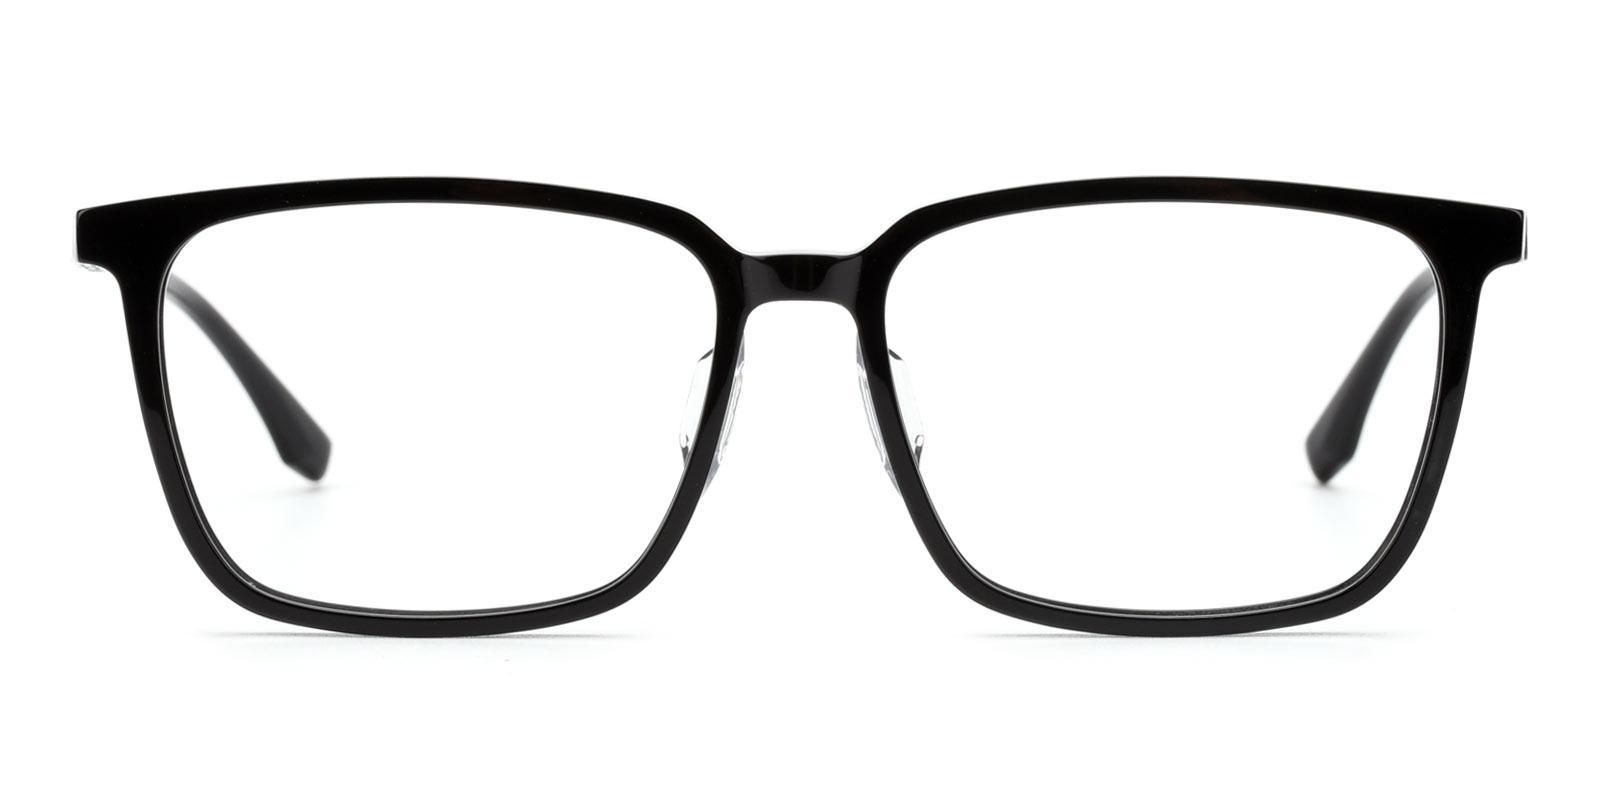 Modesty-Black-Rectangle-Titanium-Eyeglasses-detail